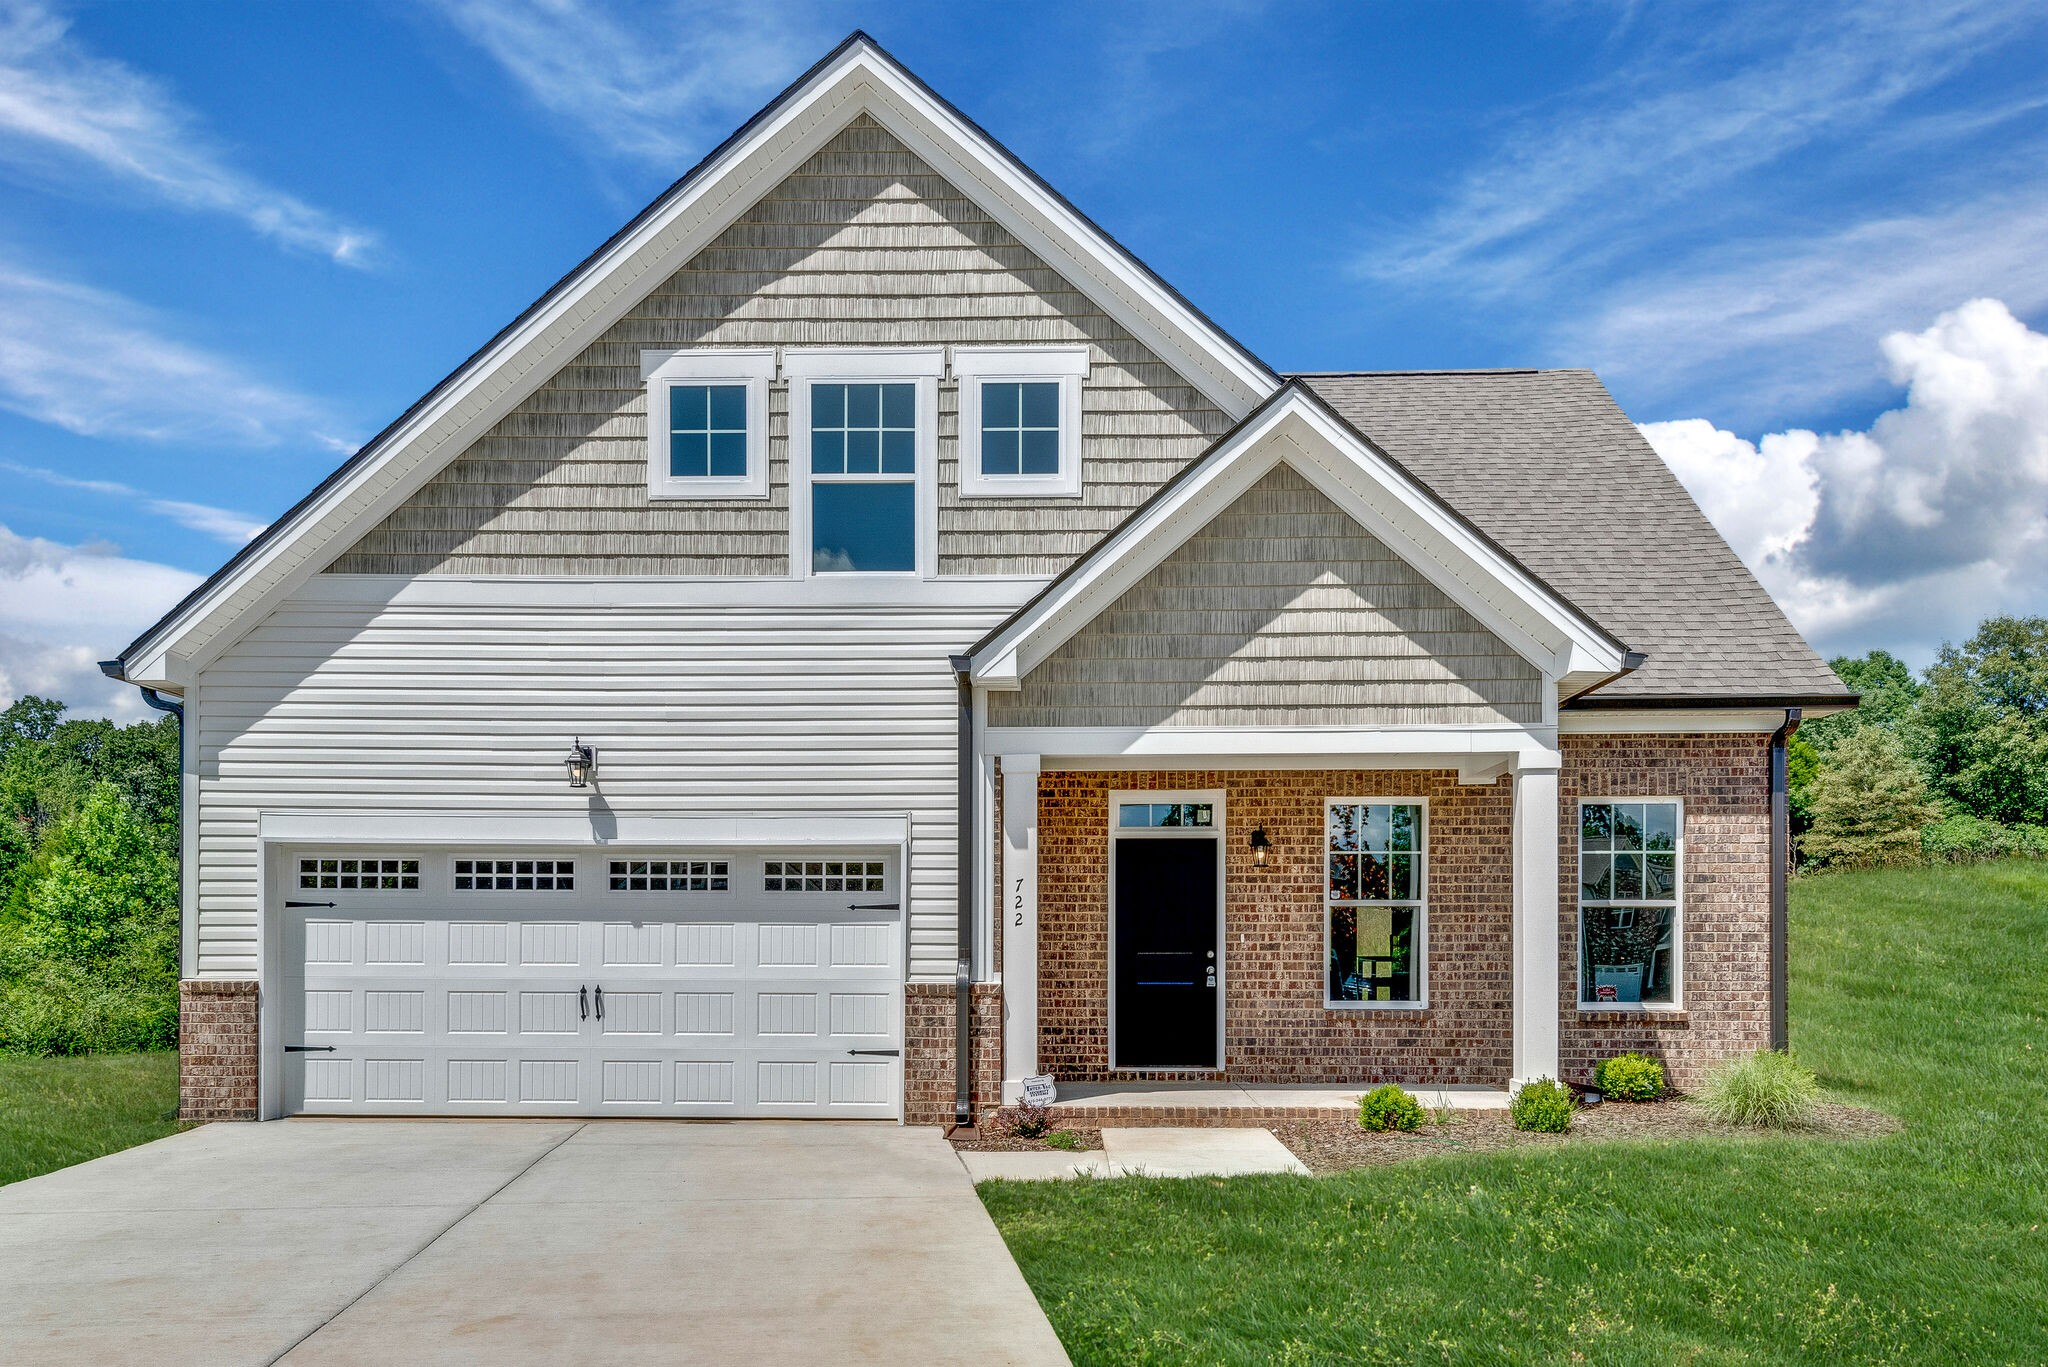 722 Monarchos Bend (Lot 95) Property Photo - Burns, TN real estate listing